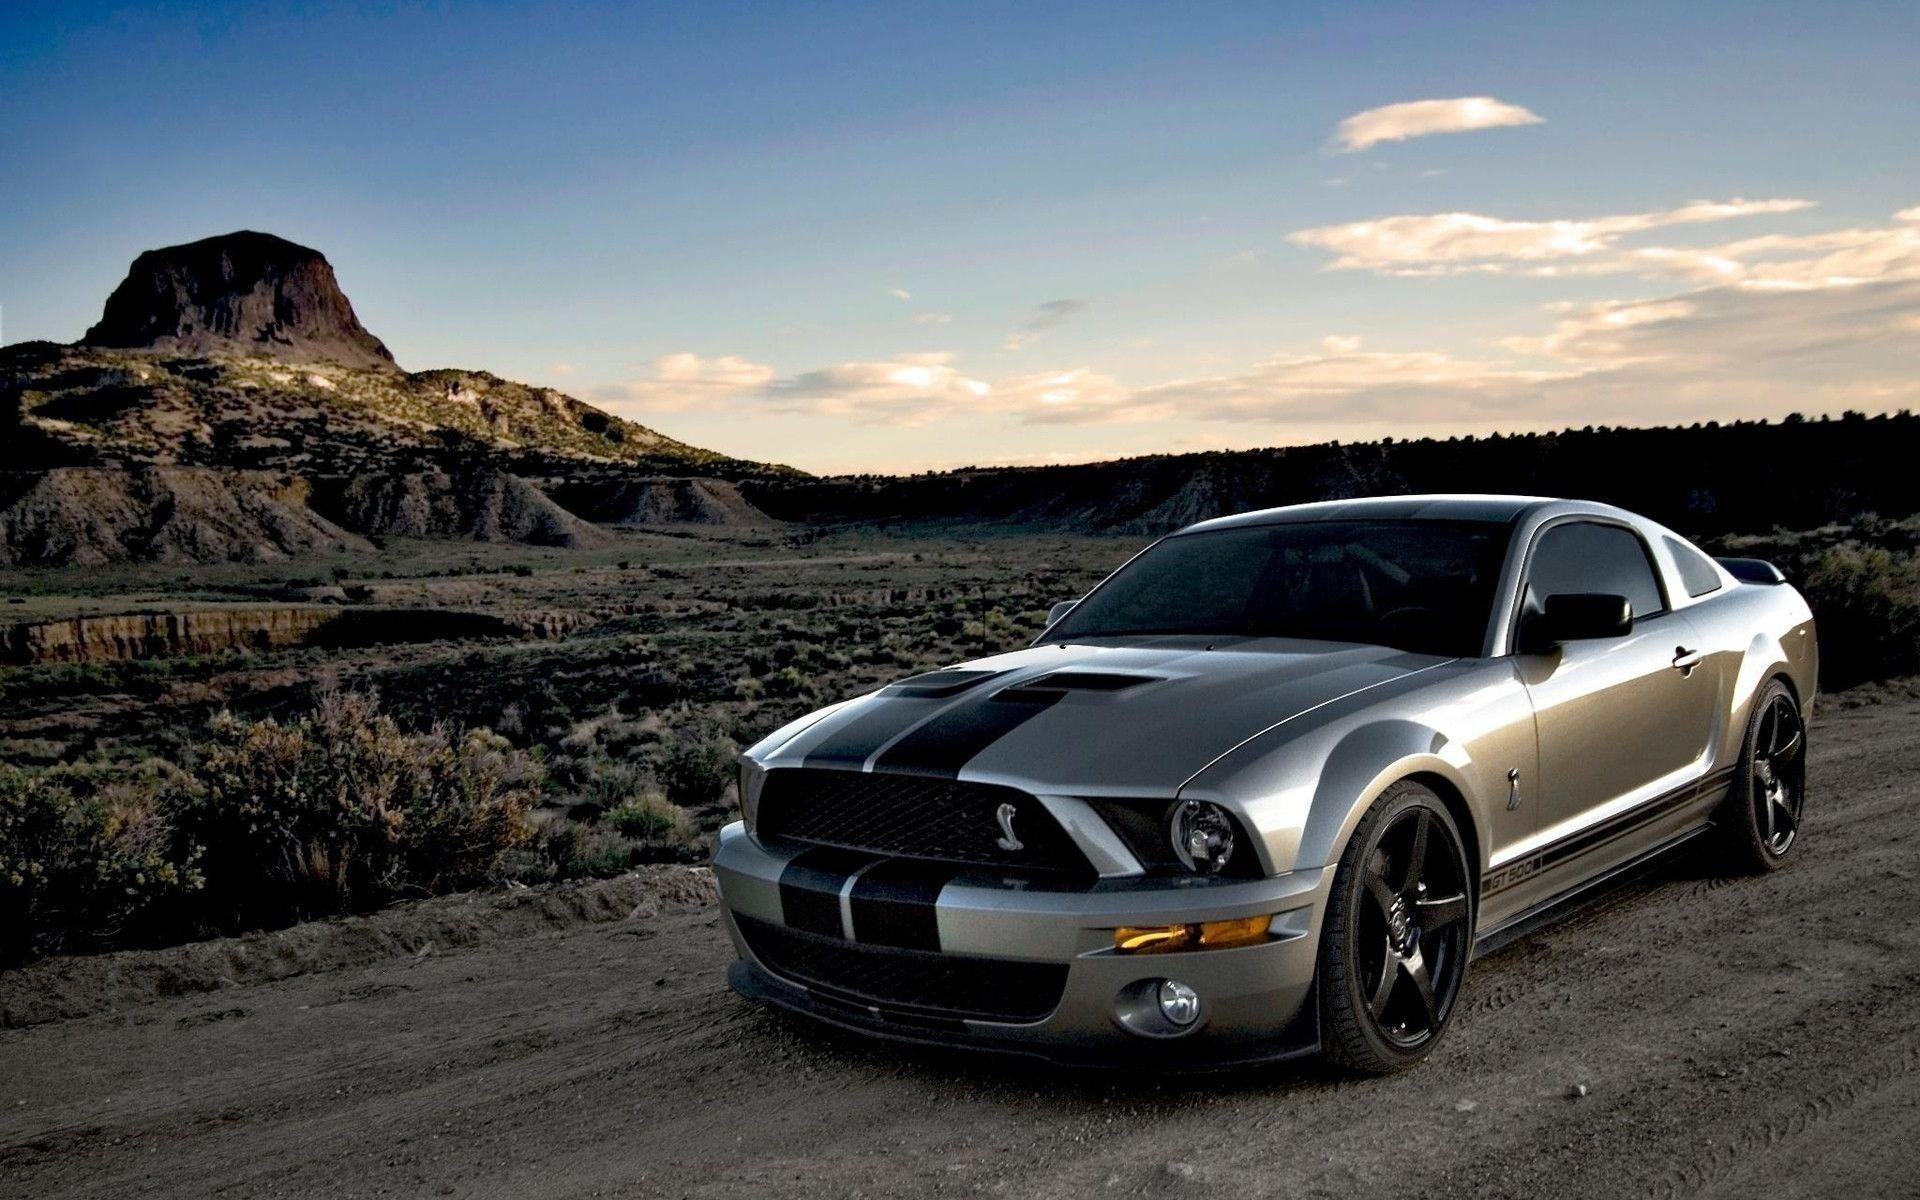 Ford Mustang Wallpaper 1080p Mustang Wallpaper Ford Mustang Wallpaper Ford Mustang